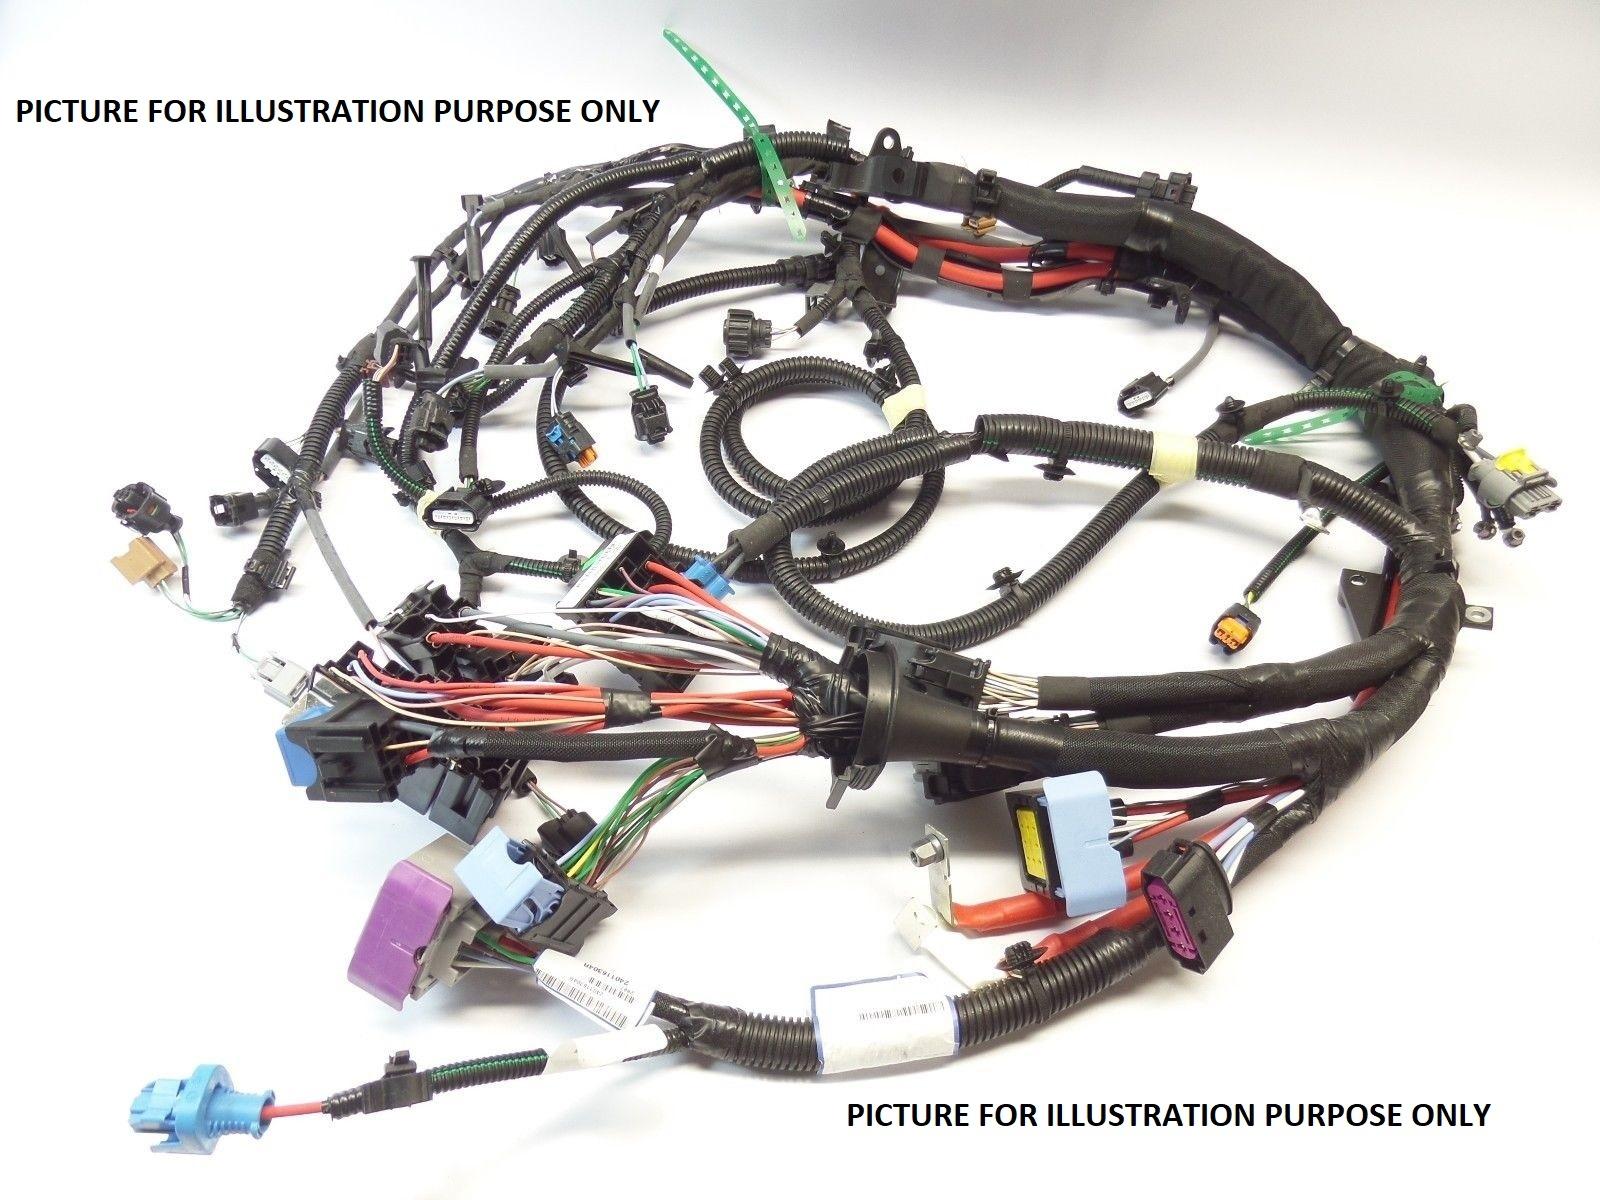 hight resolution of genuine vauxhall vectra signum 2 0 engine wiring harness